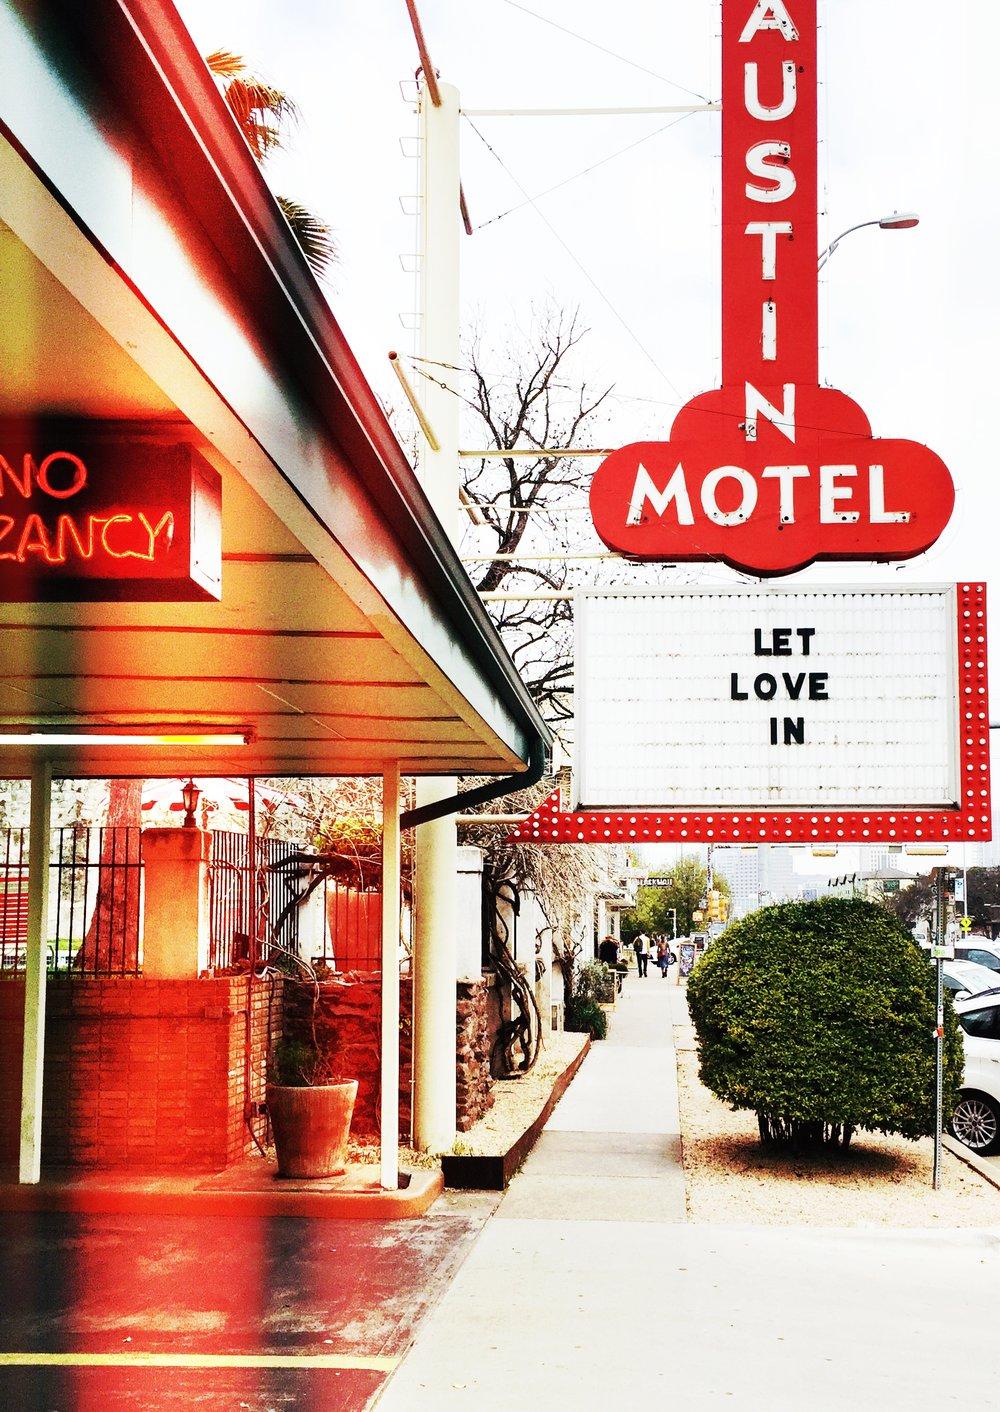 Austin Motel | 1220 S Congress Ave